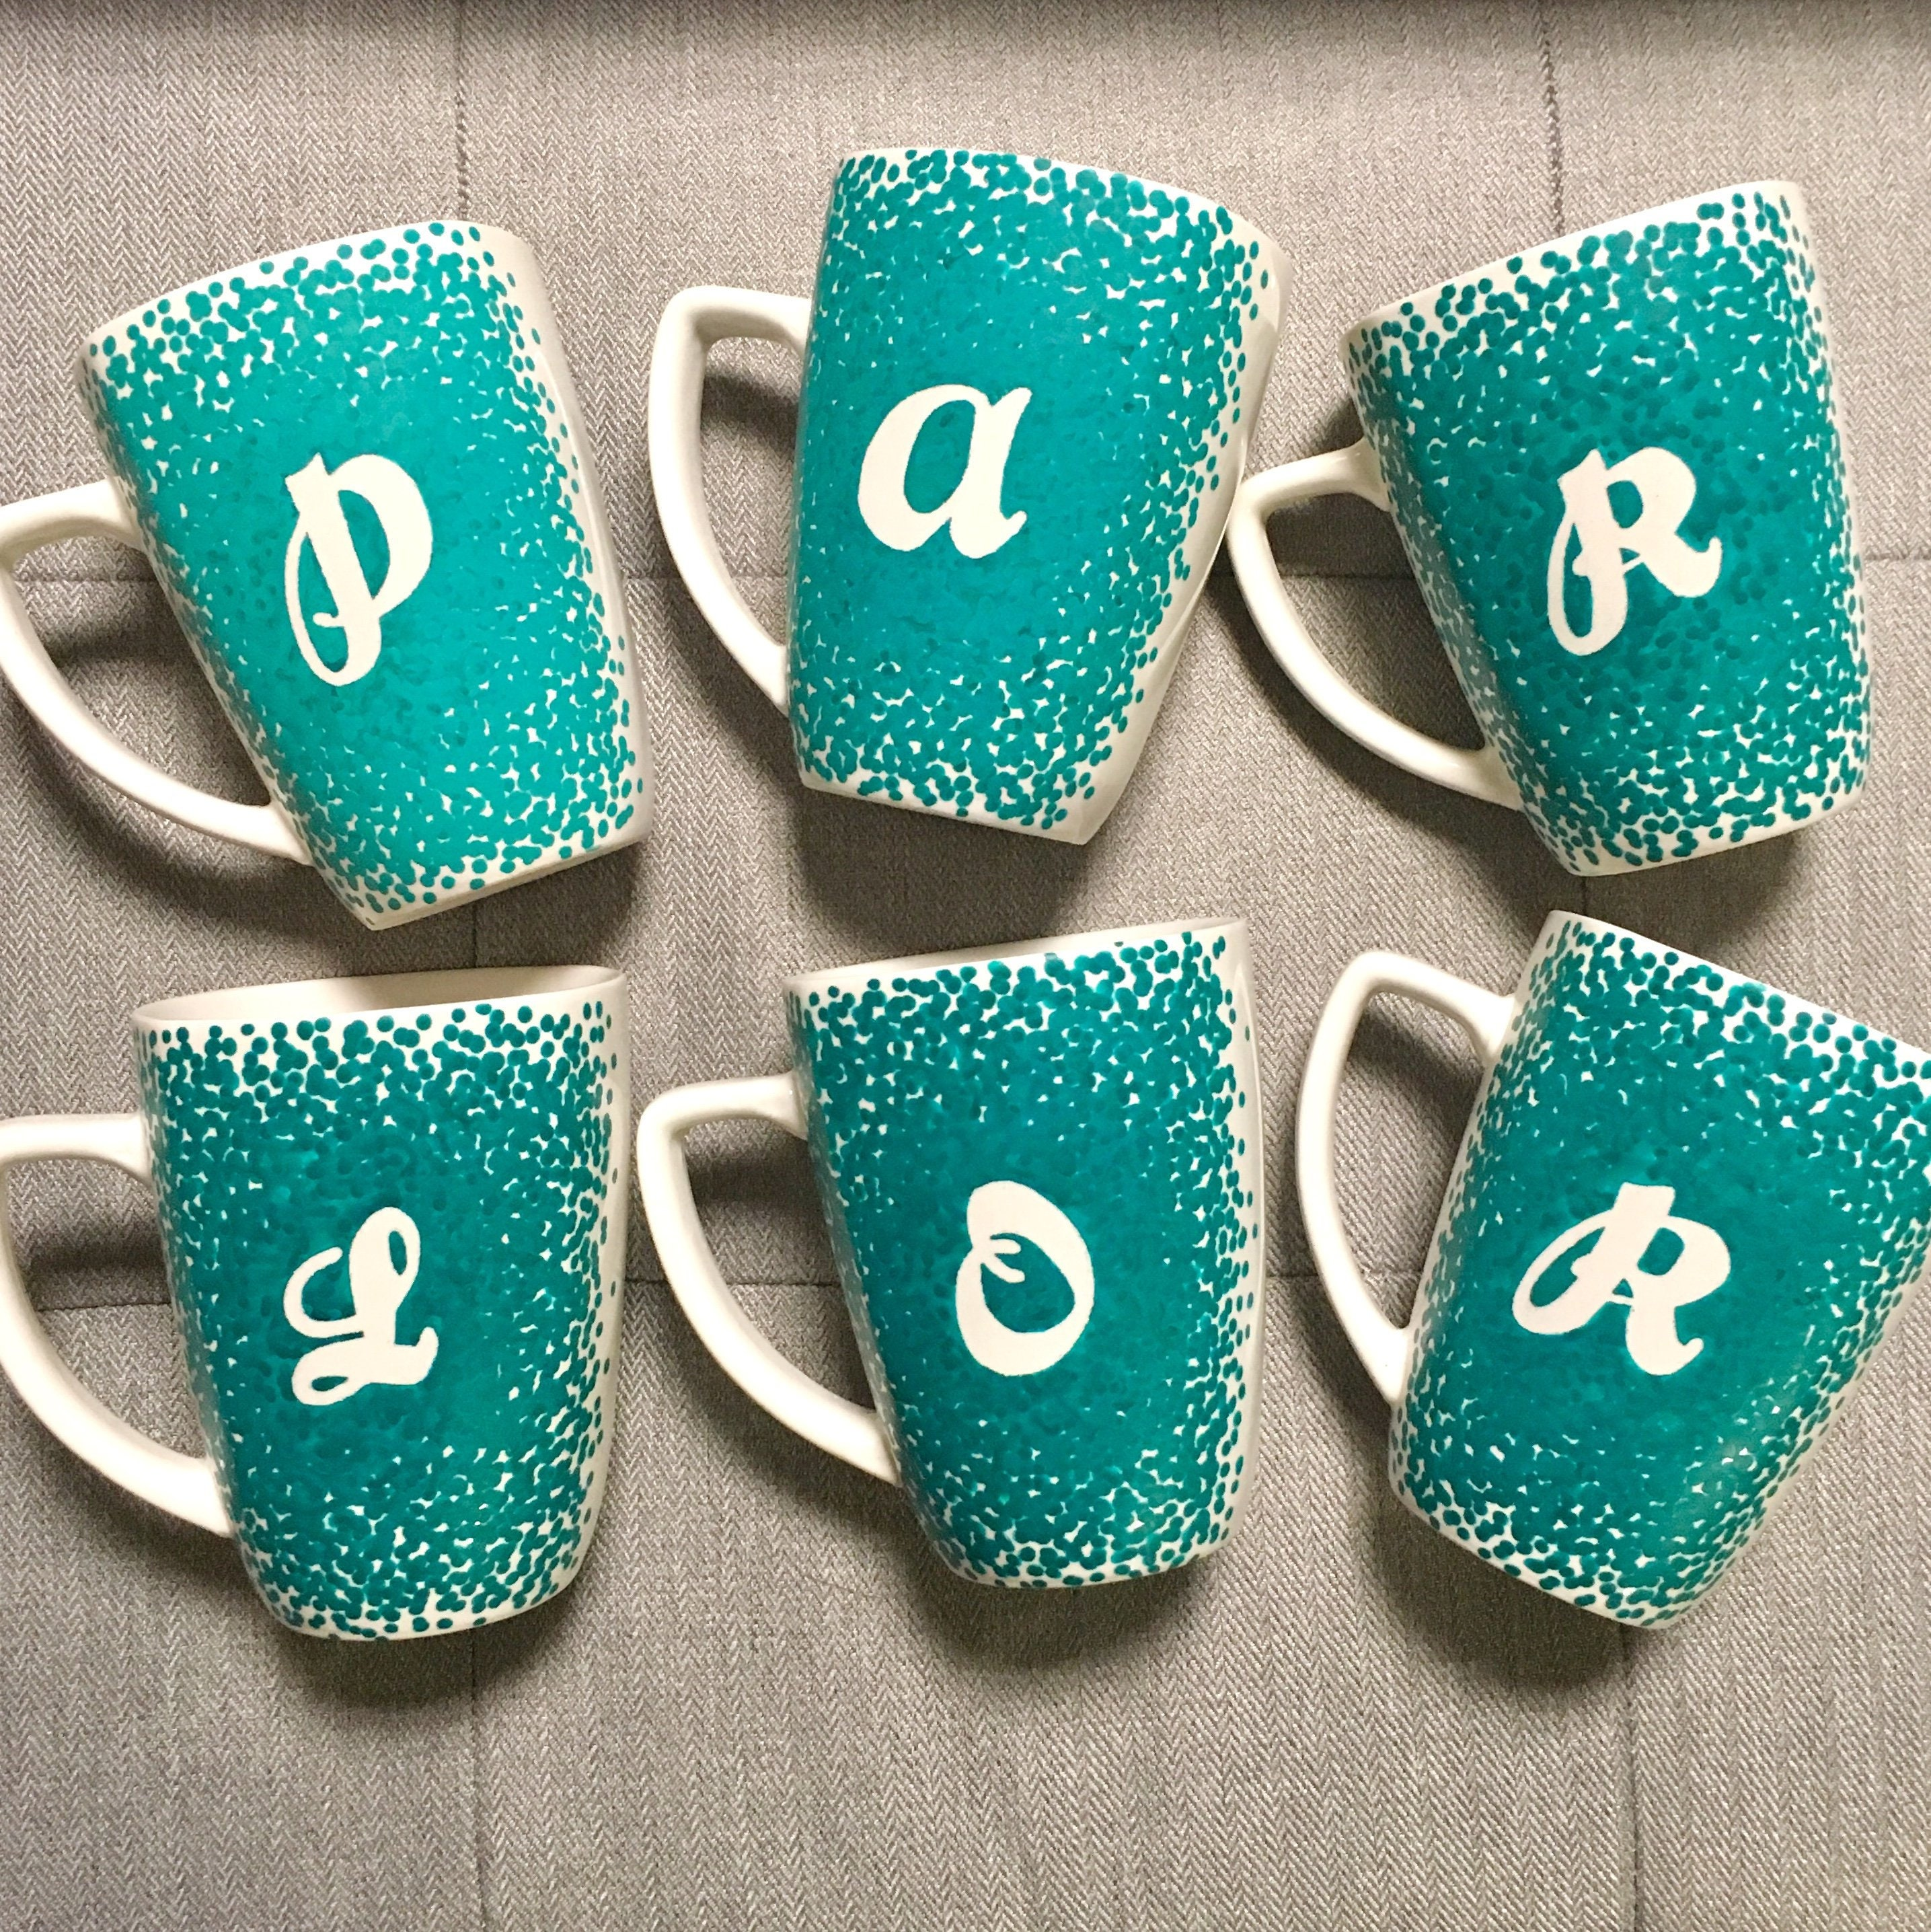 custom initials coffee mug custom coffee mug initials mug letter mug custom mug initial coffee mug letter coffee mug painted mug